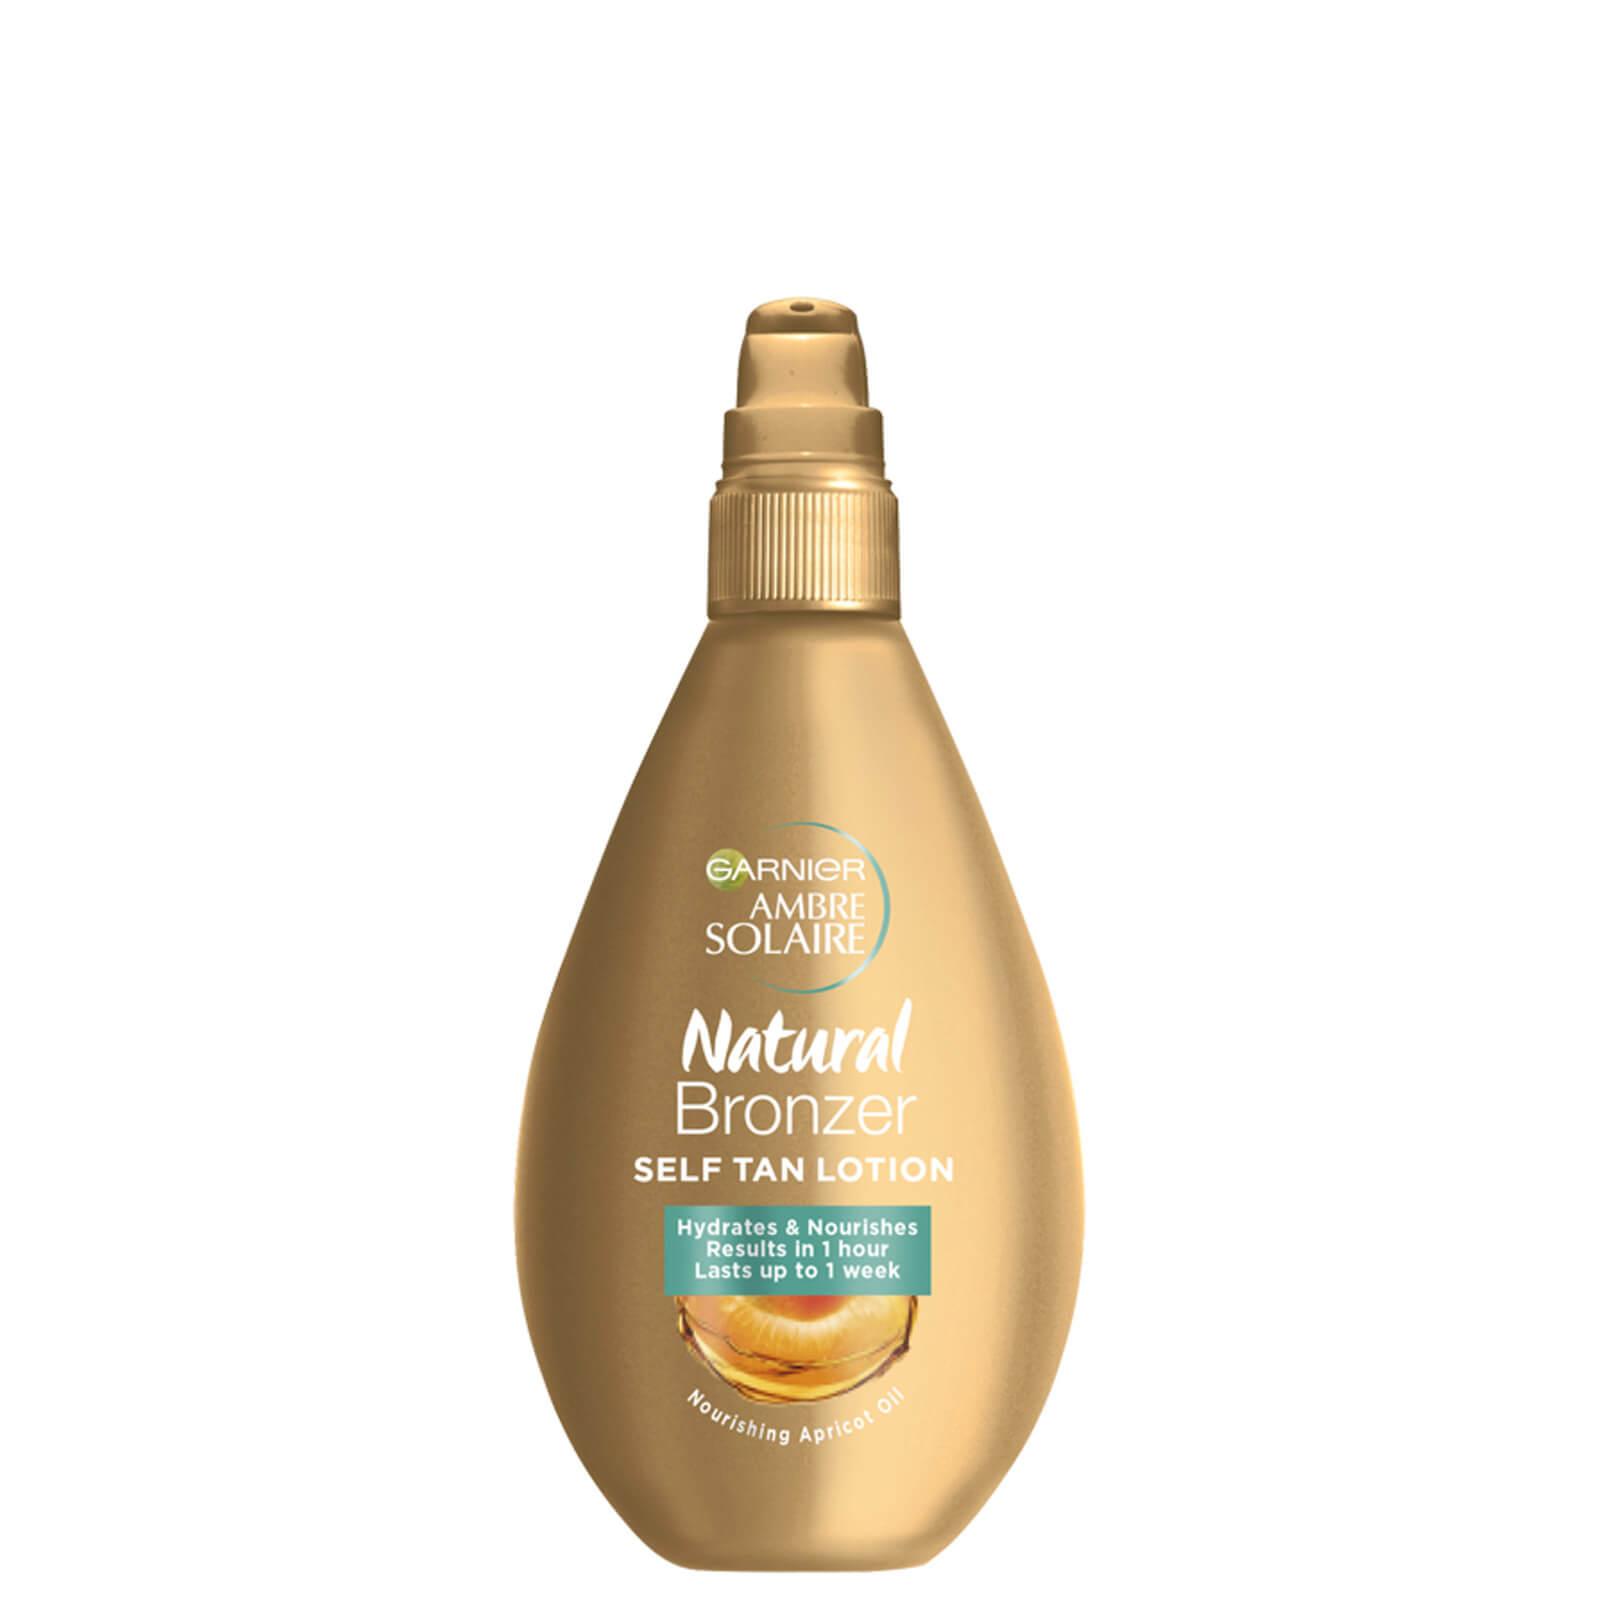 Купить Лосьон для автозагара Ambre Solaire Natural Bronzer Self Tan Lotion 150ml